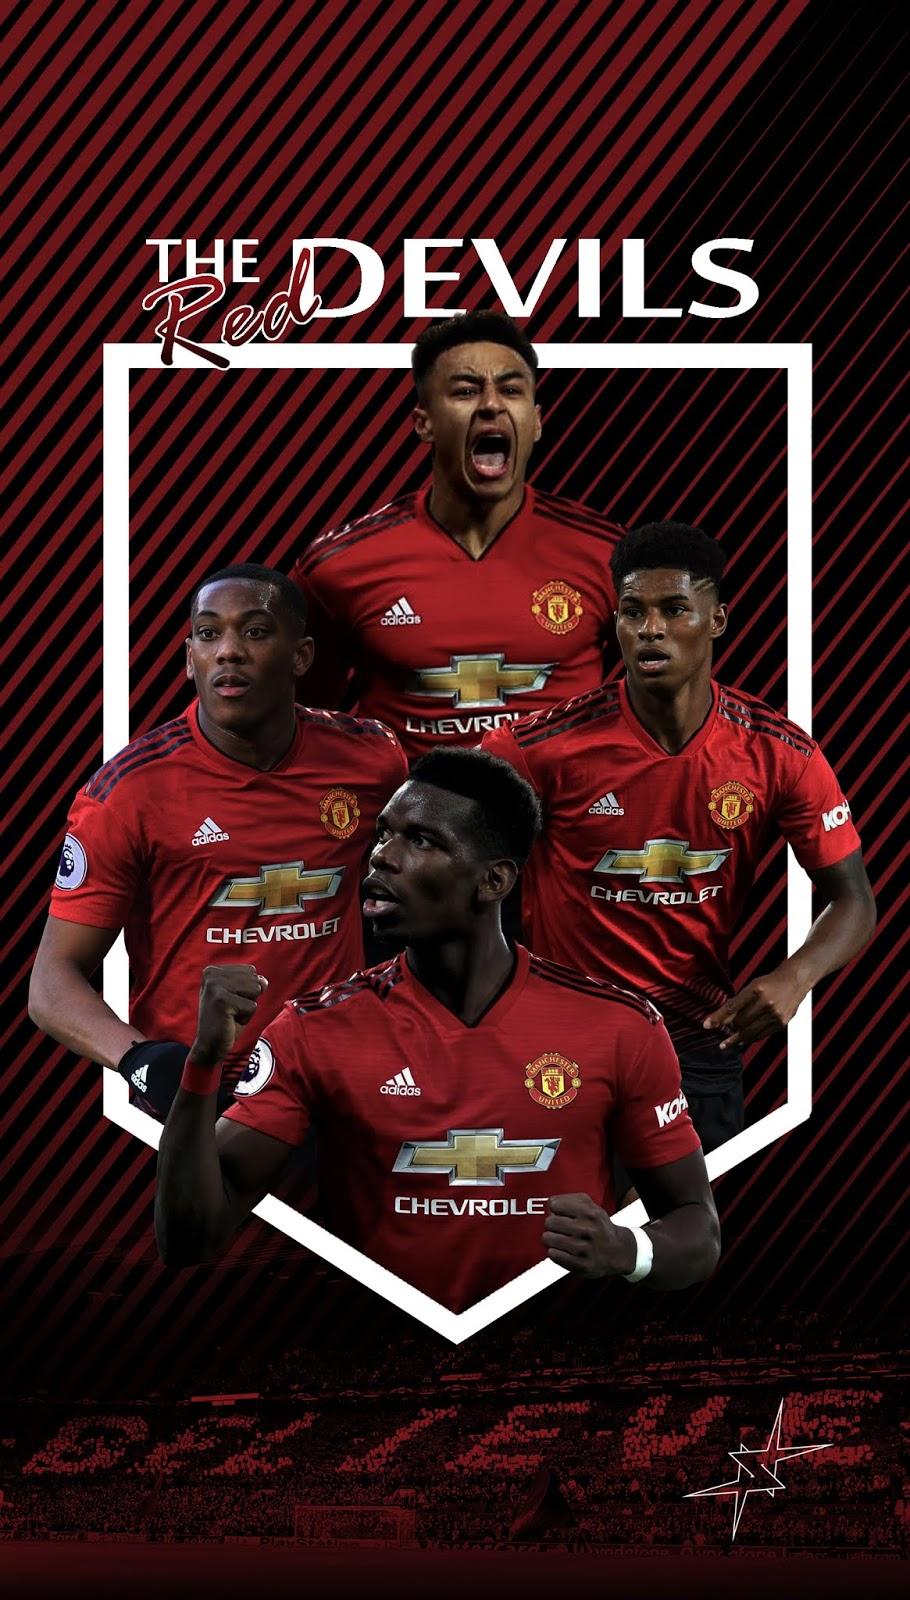 Wallpaper Manchester United Terbaru Man U Wallpaper 2019 910x1600 Wallpaper Teahub Io